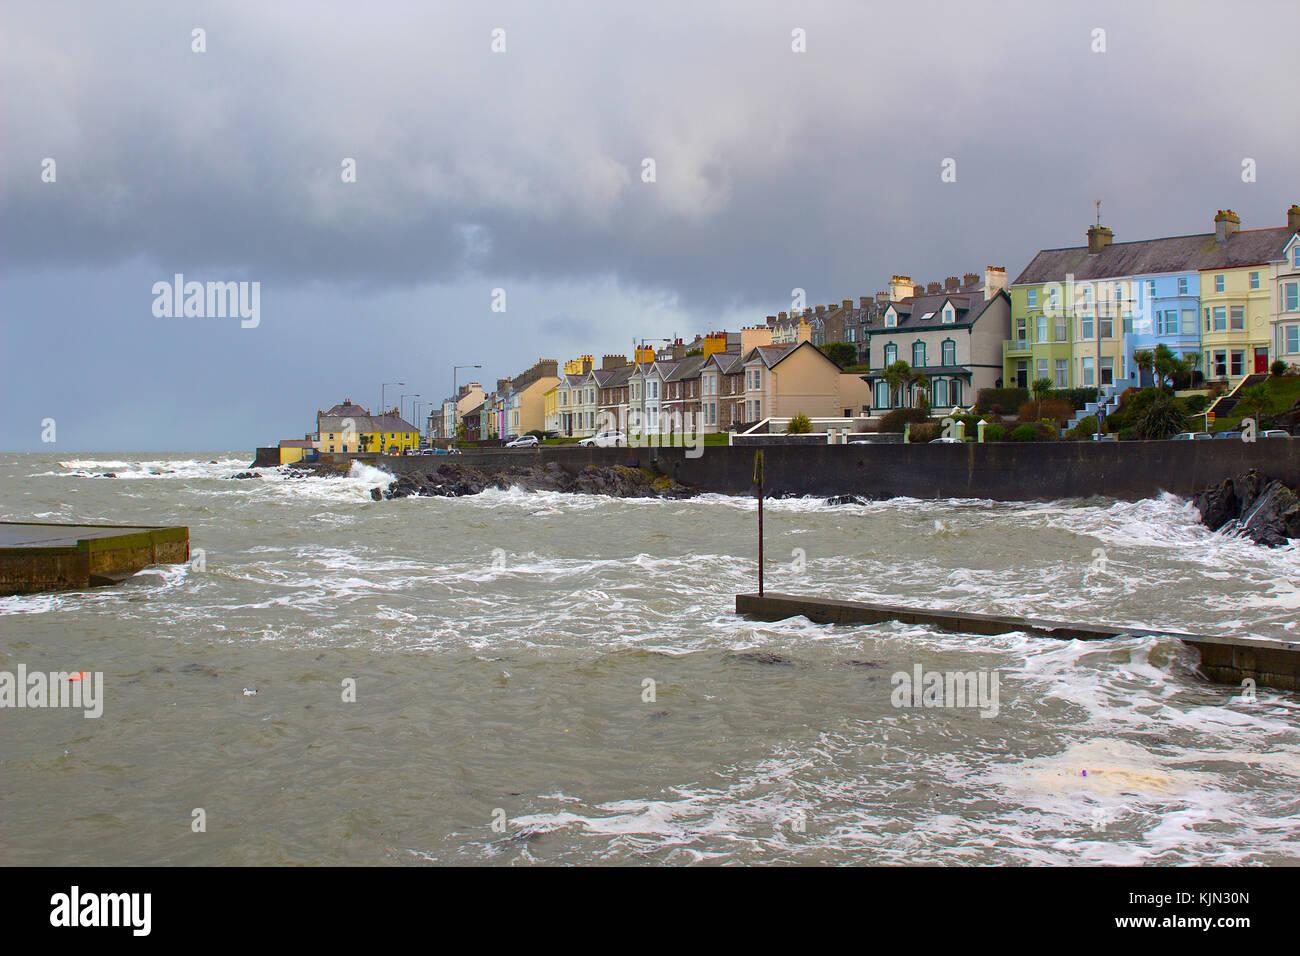 a-fierce-storm-in-the-irish-sea-batters-the-coastal-the-entrance-to-KJN30N.jpg